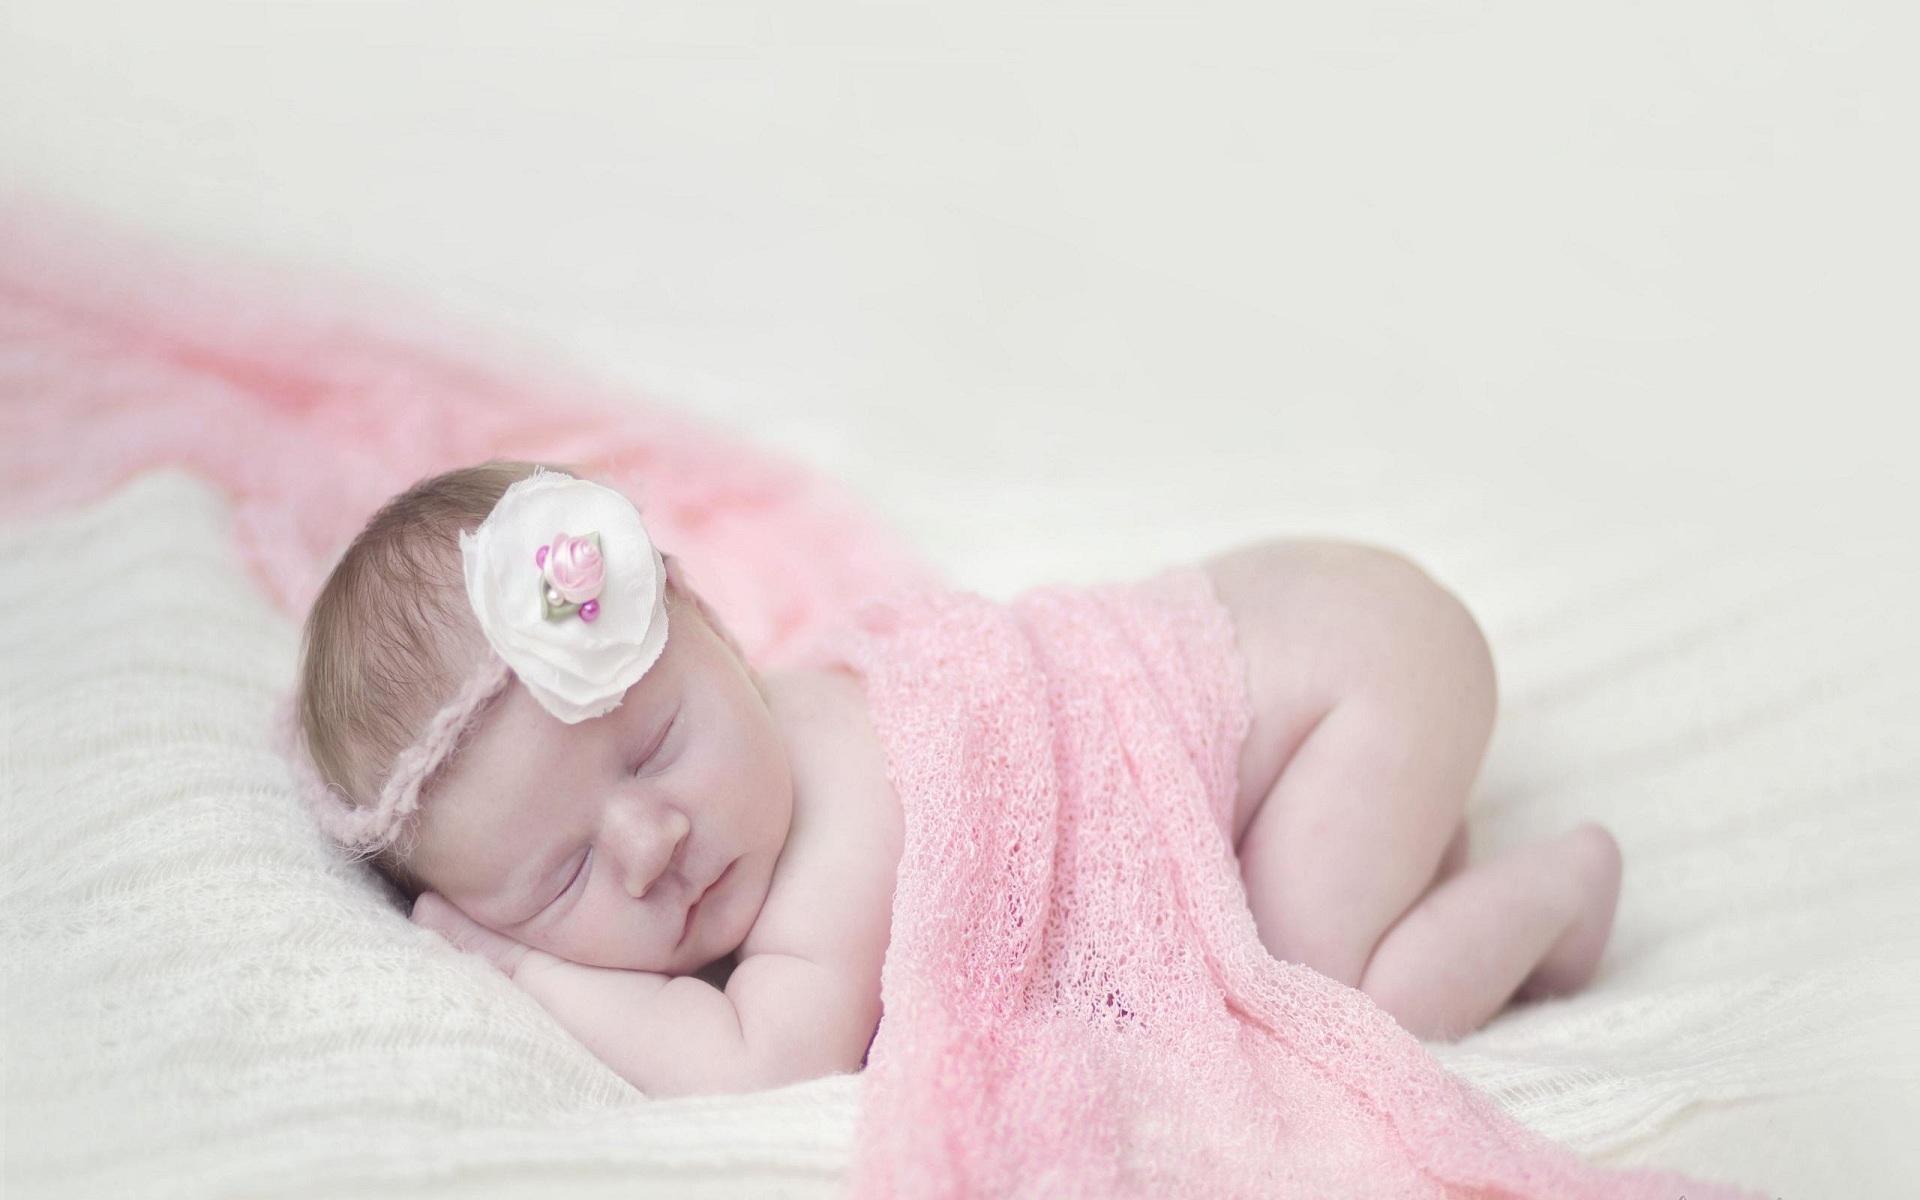 baby flower pink wallpaper for mobile